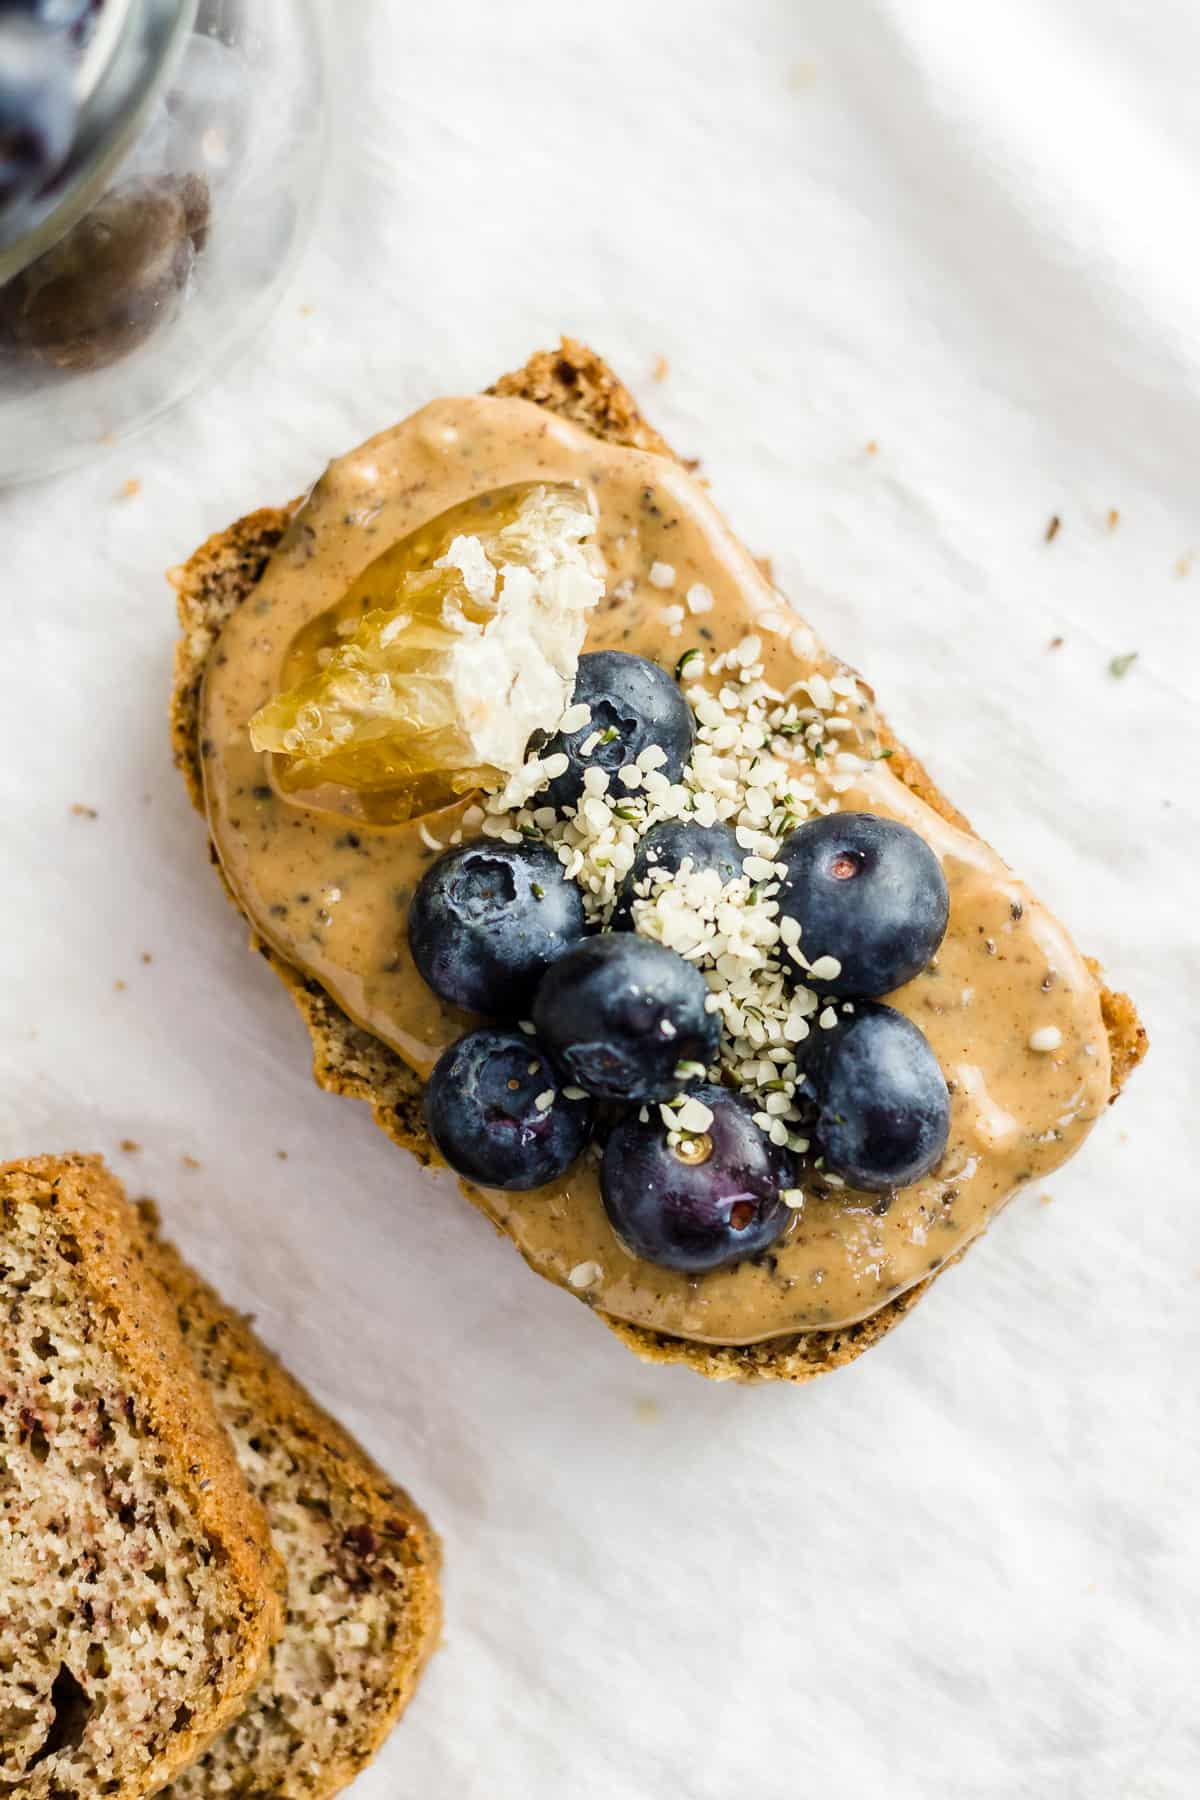 Easy Paleo Sandwich Bread recipe